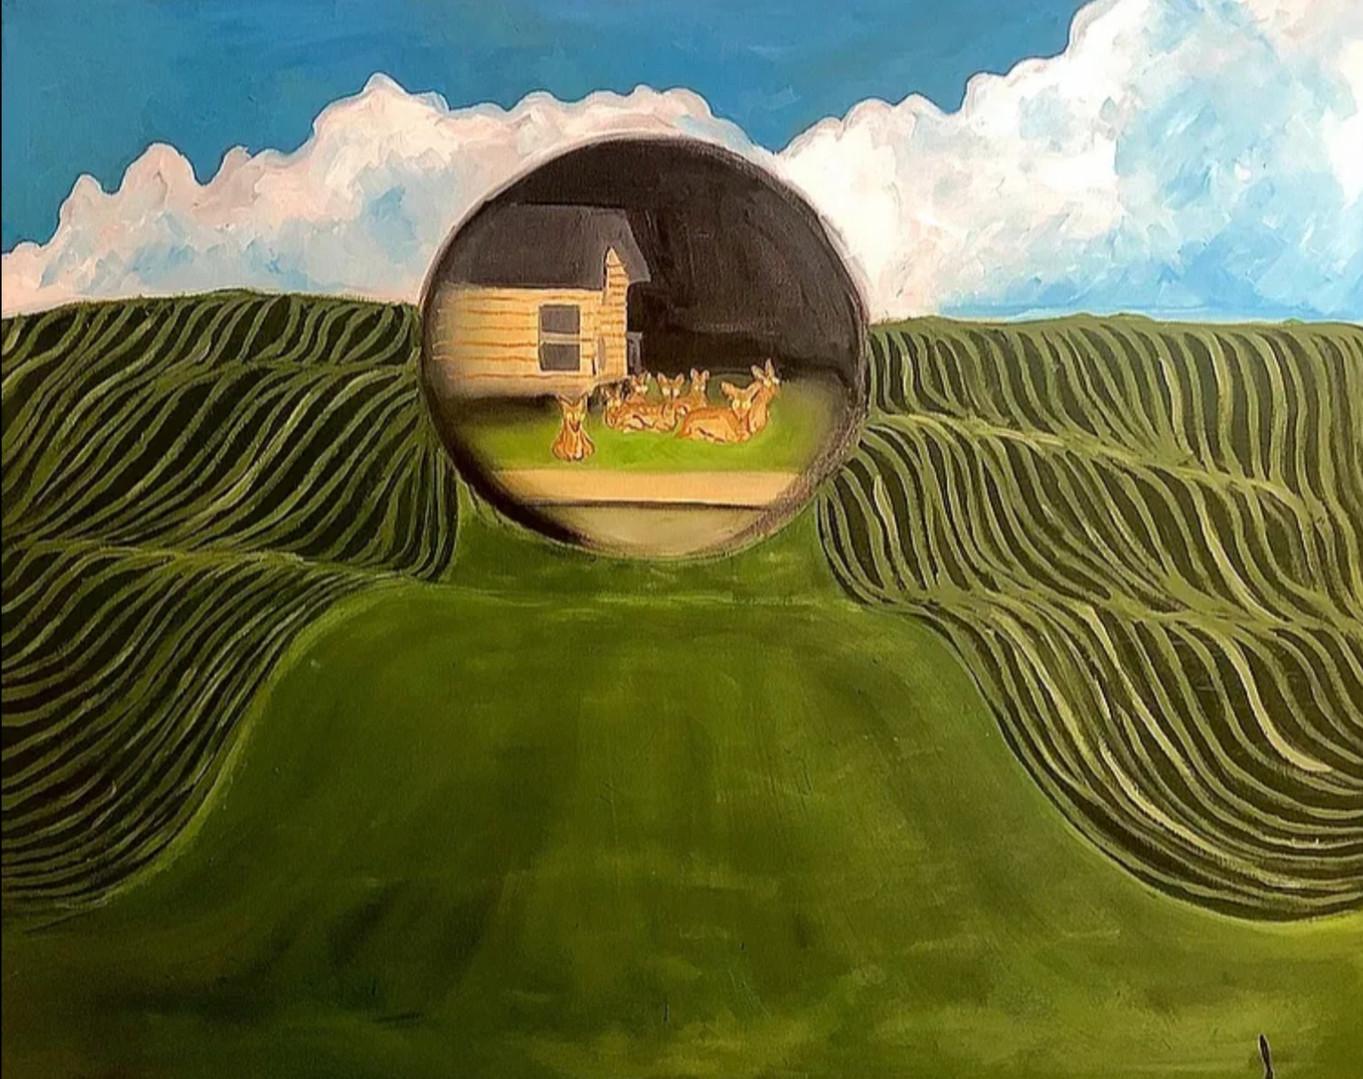 Class: Painting II